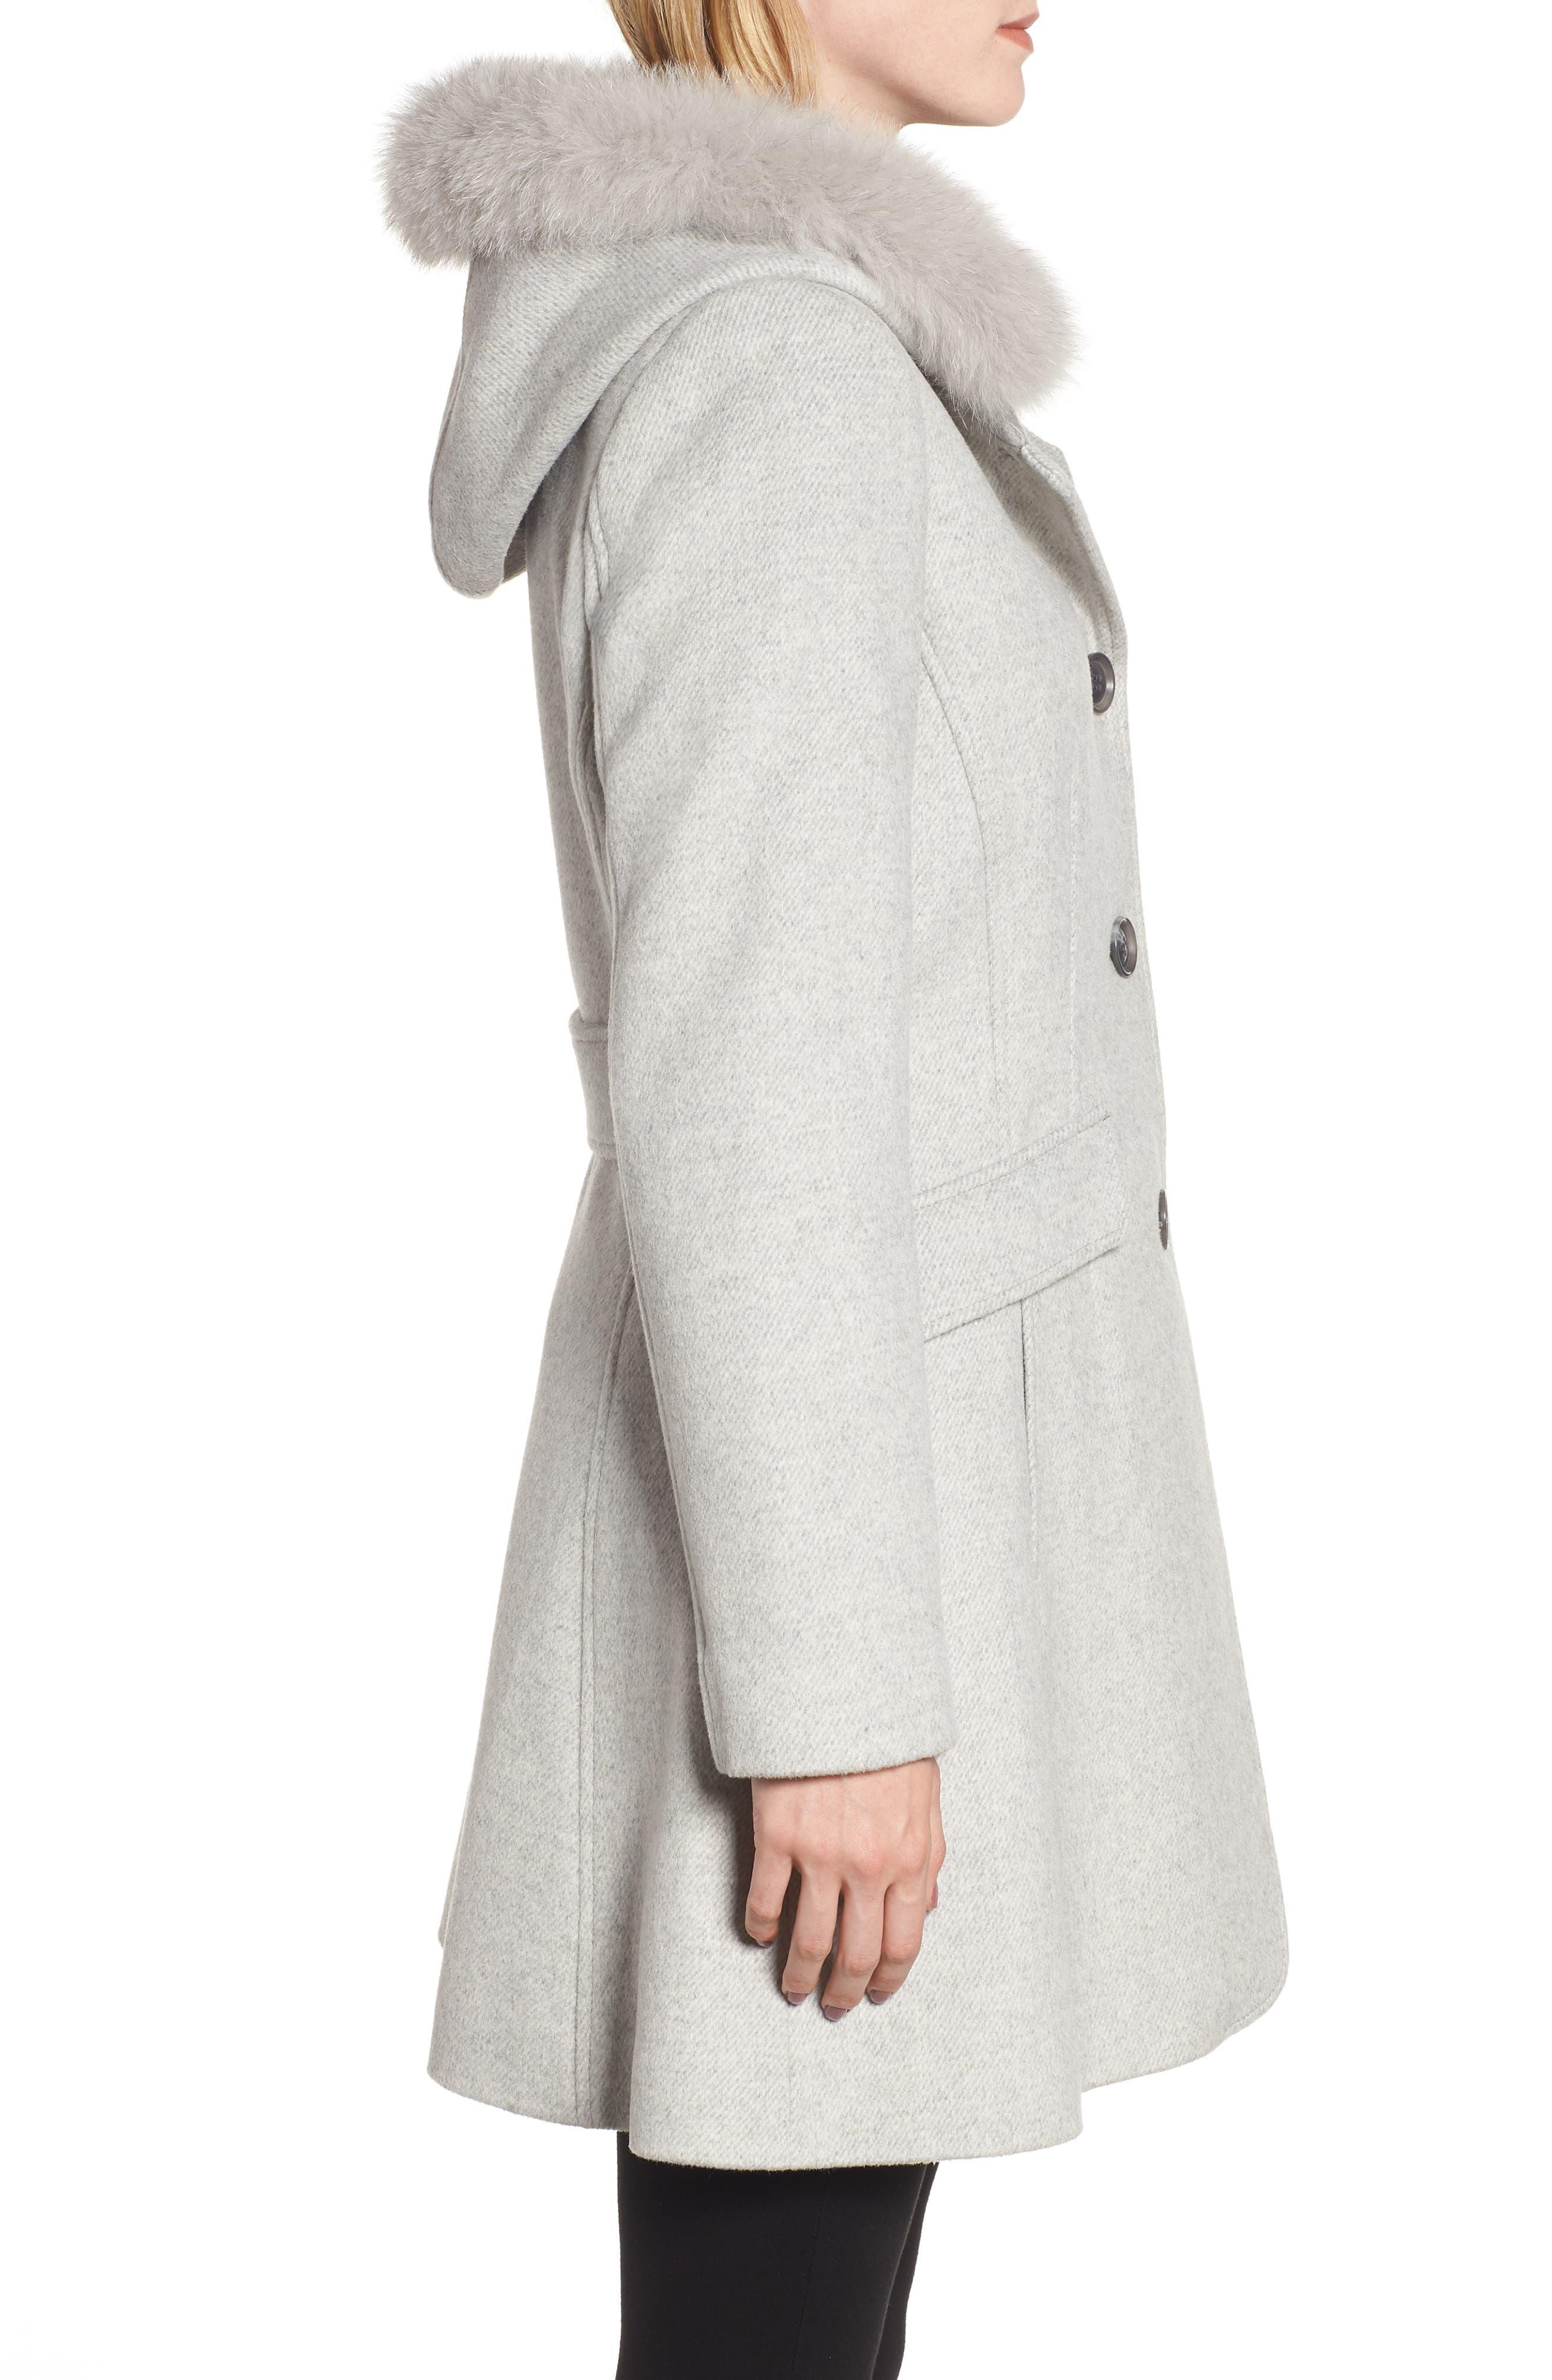 KRISTEN BLAKE,                             Genuine Fox Trim Hooded Wool Coat,                             Alternate thumbnail 3, color,                             GREY MELANGE